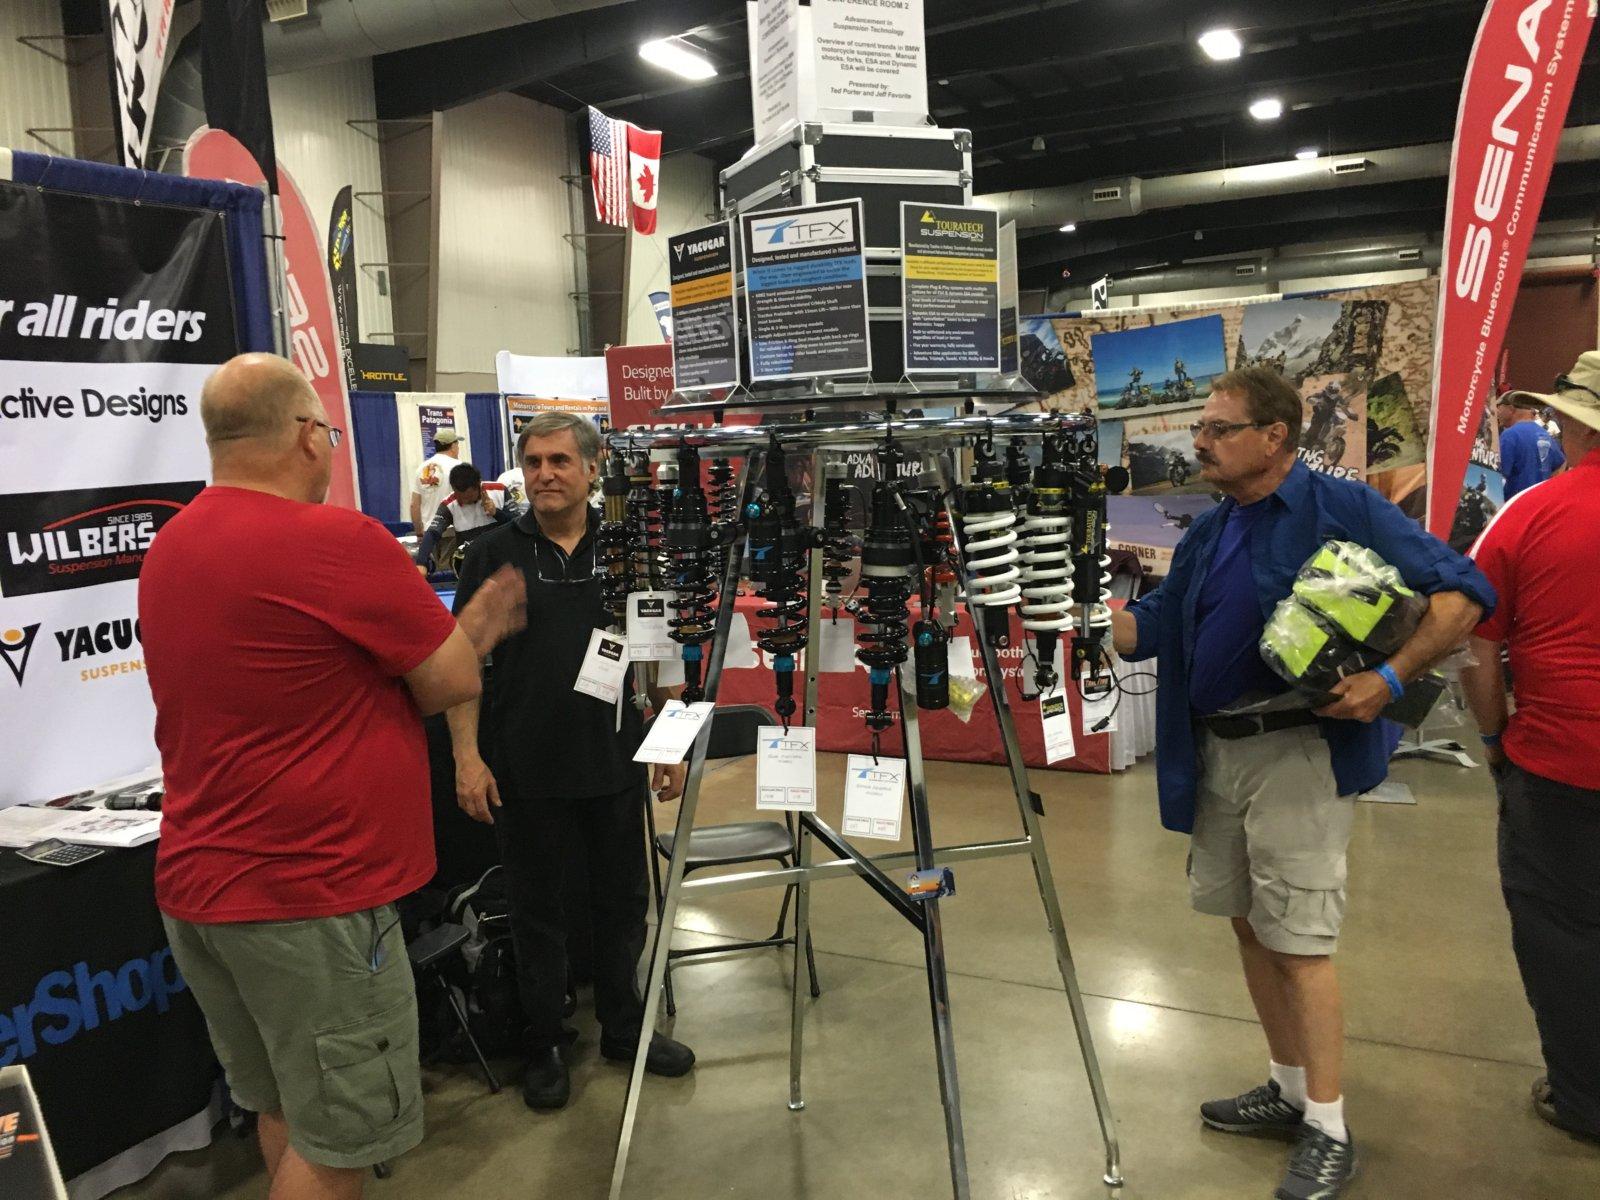 715-VendorBeemerShop